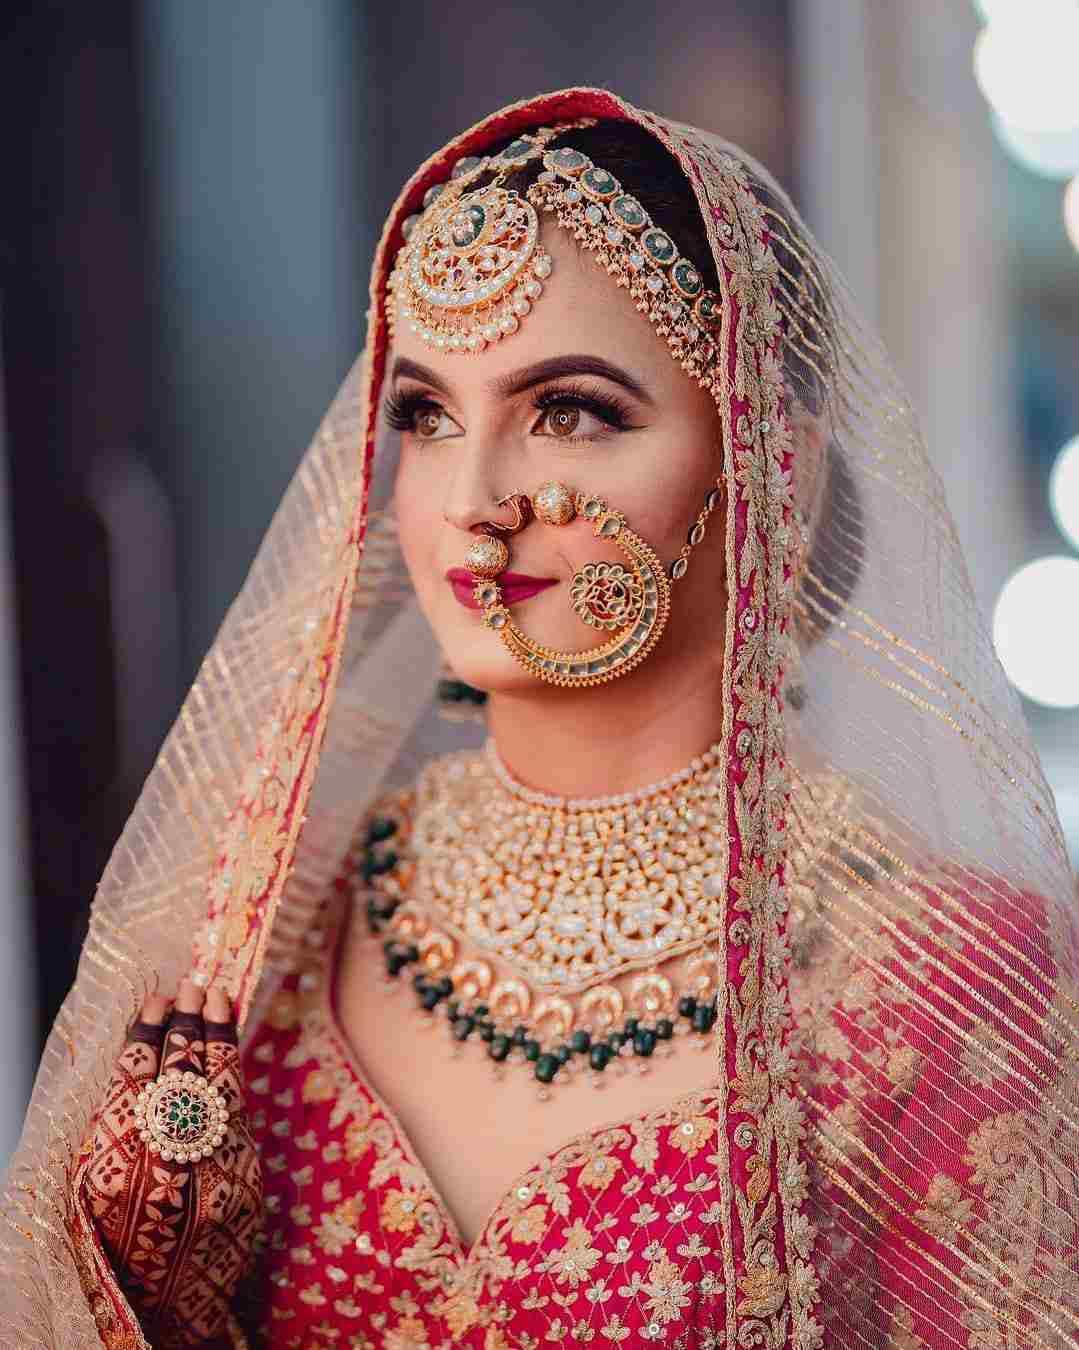 Bridal portrait | Bridal jewellery | Bridal jewelry | Nath | Naath | Bridal look